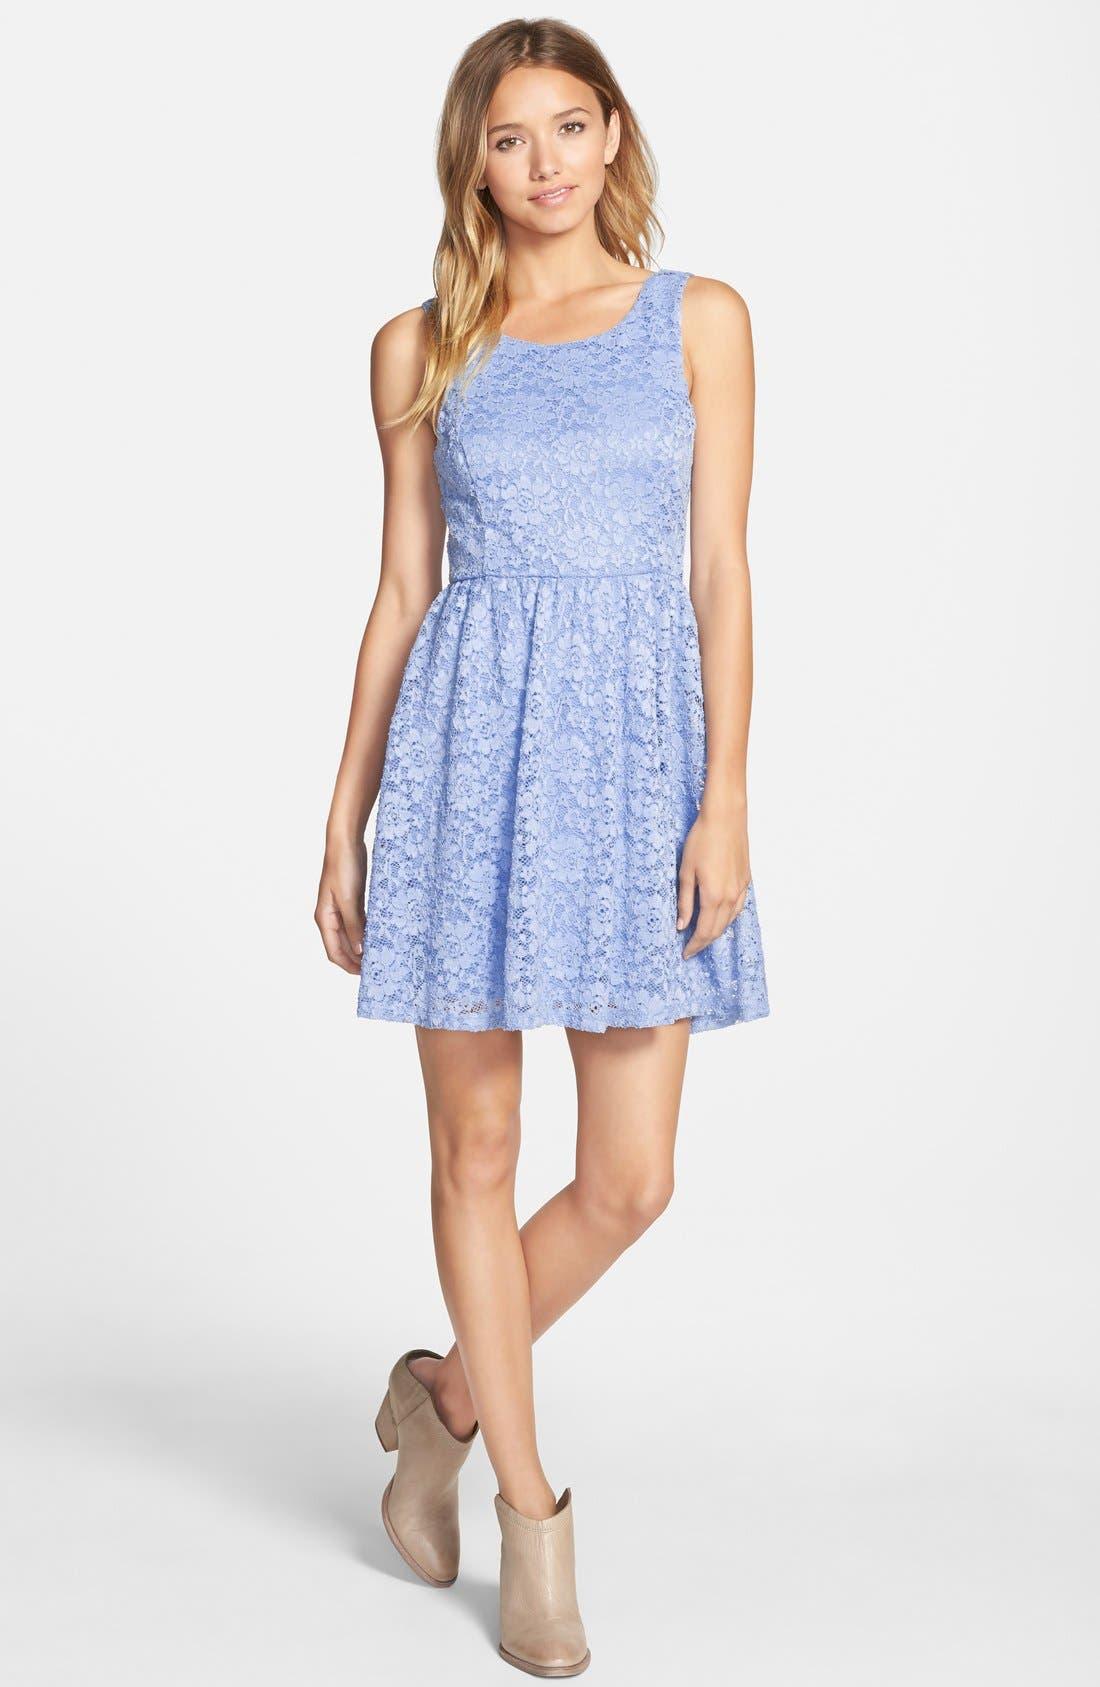 Main Image - Lush Lace Skater Dress